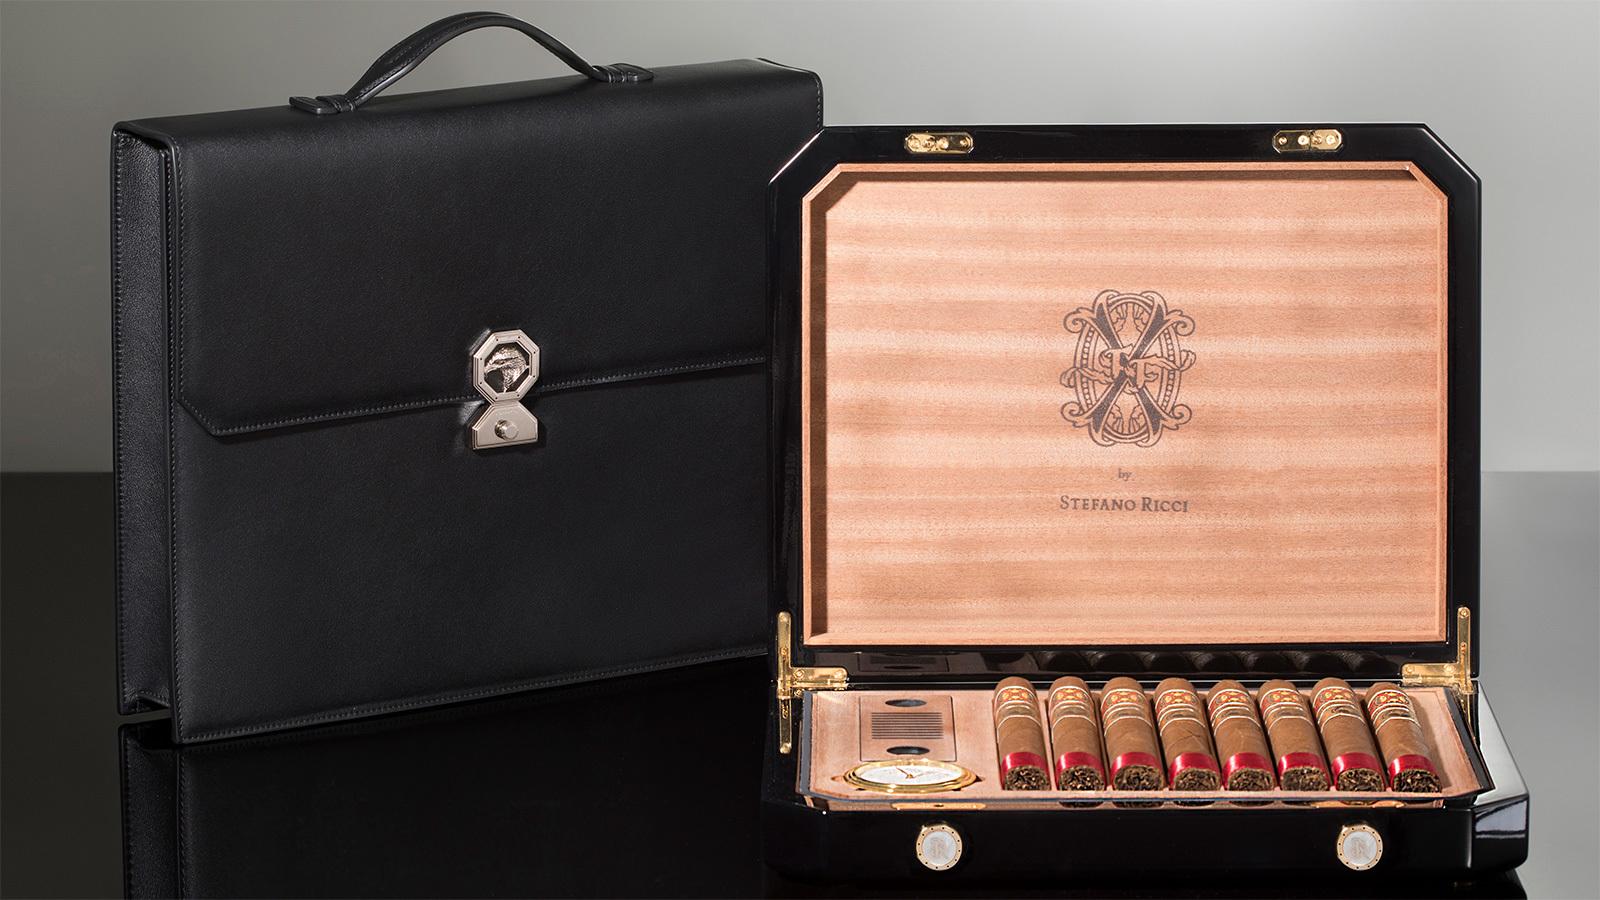 stefano_ricci_arturo_fuente-humidor-_cigarmonkeys_com_cigar_life_style_1.jpg